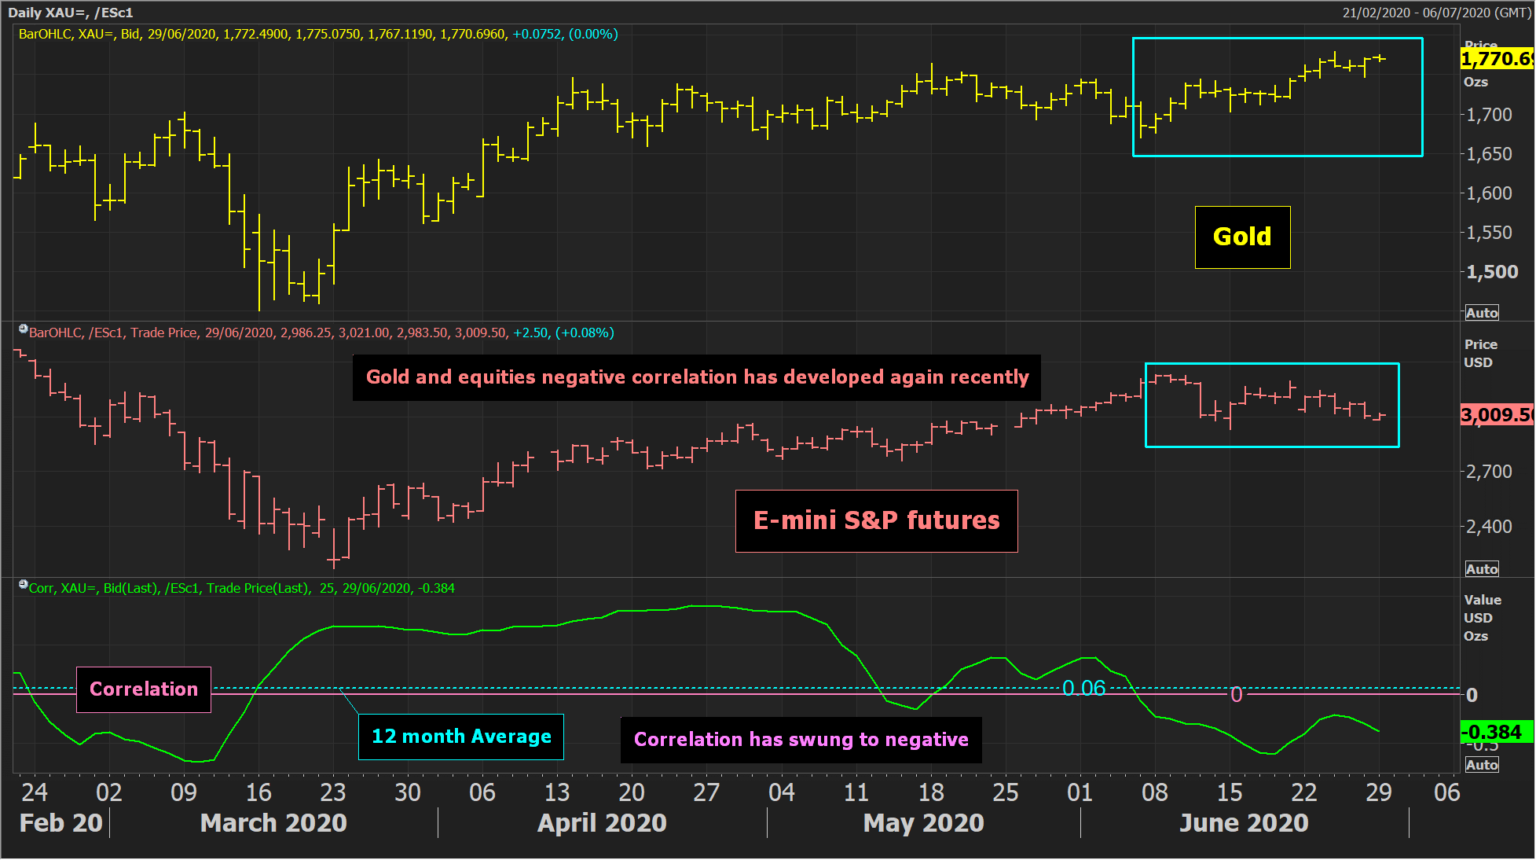 S&P E-mini Futures Daily Chart